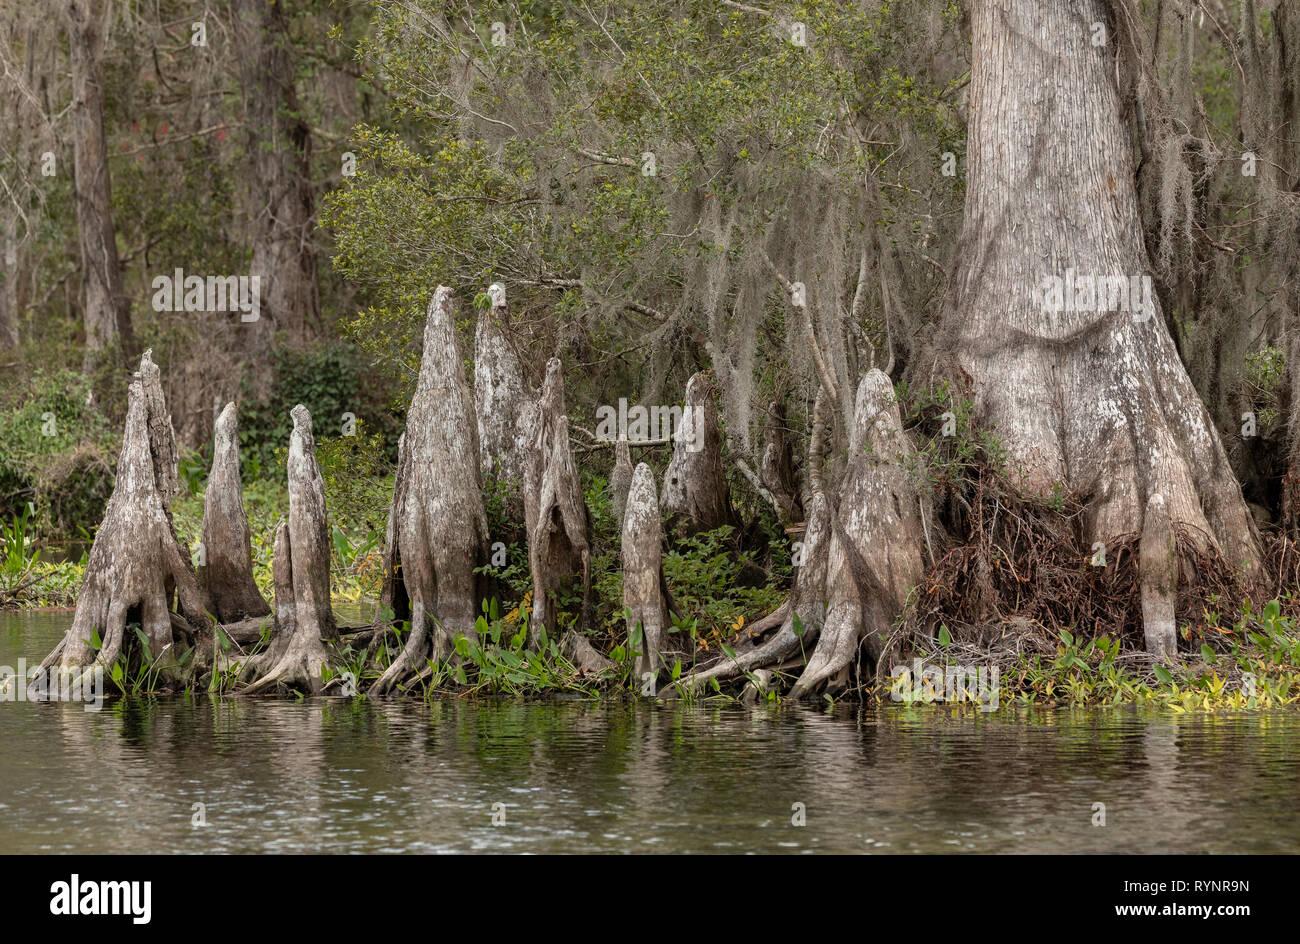 Bald Cypress, Taxodium distichum, woodland in Lower Suwannee National Wildlife Refuge, West Florida. Stock Photo